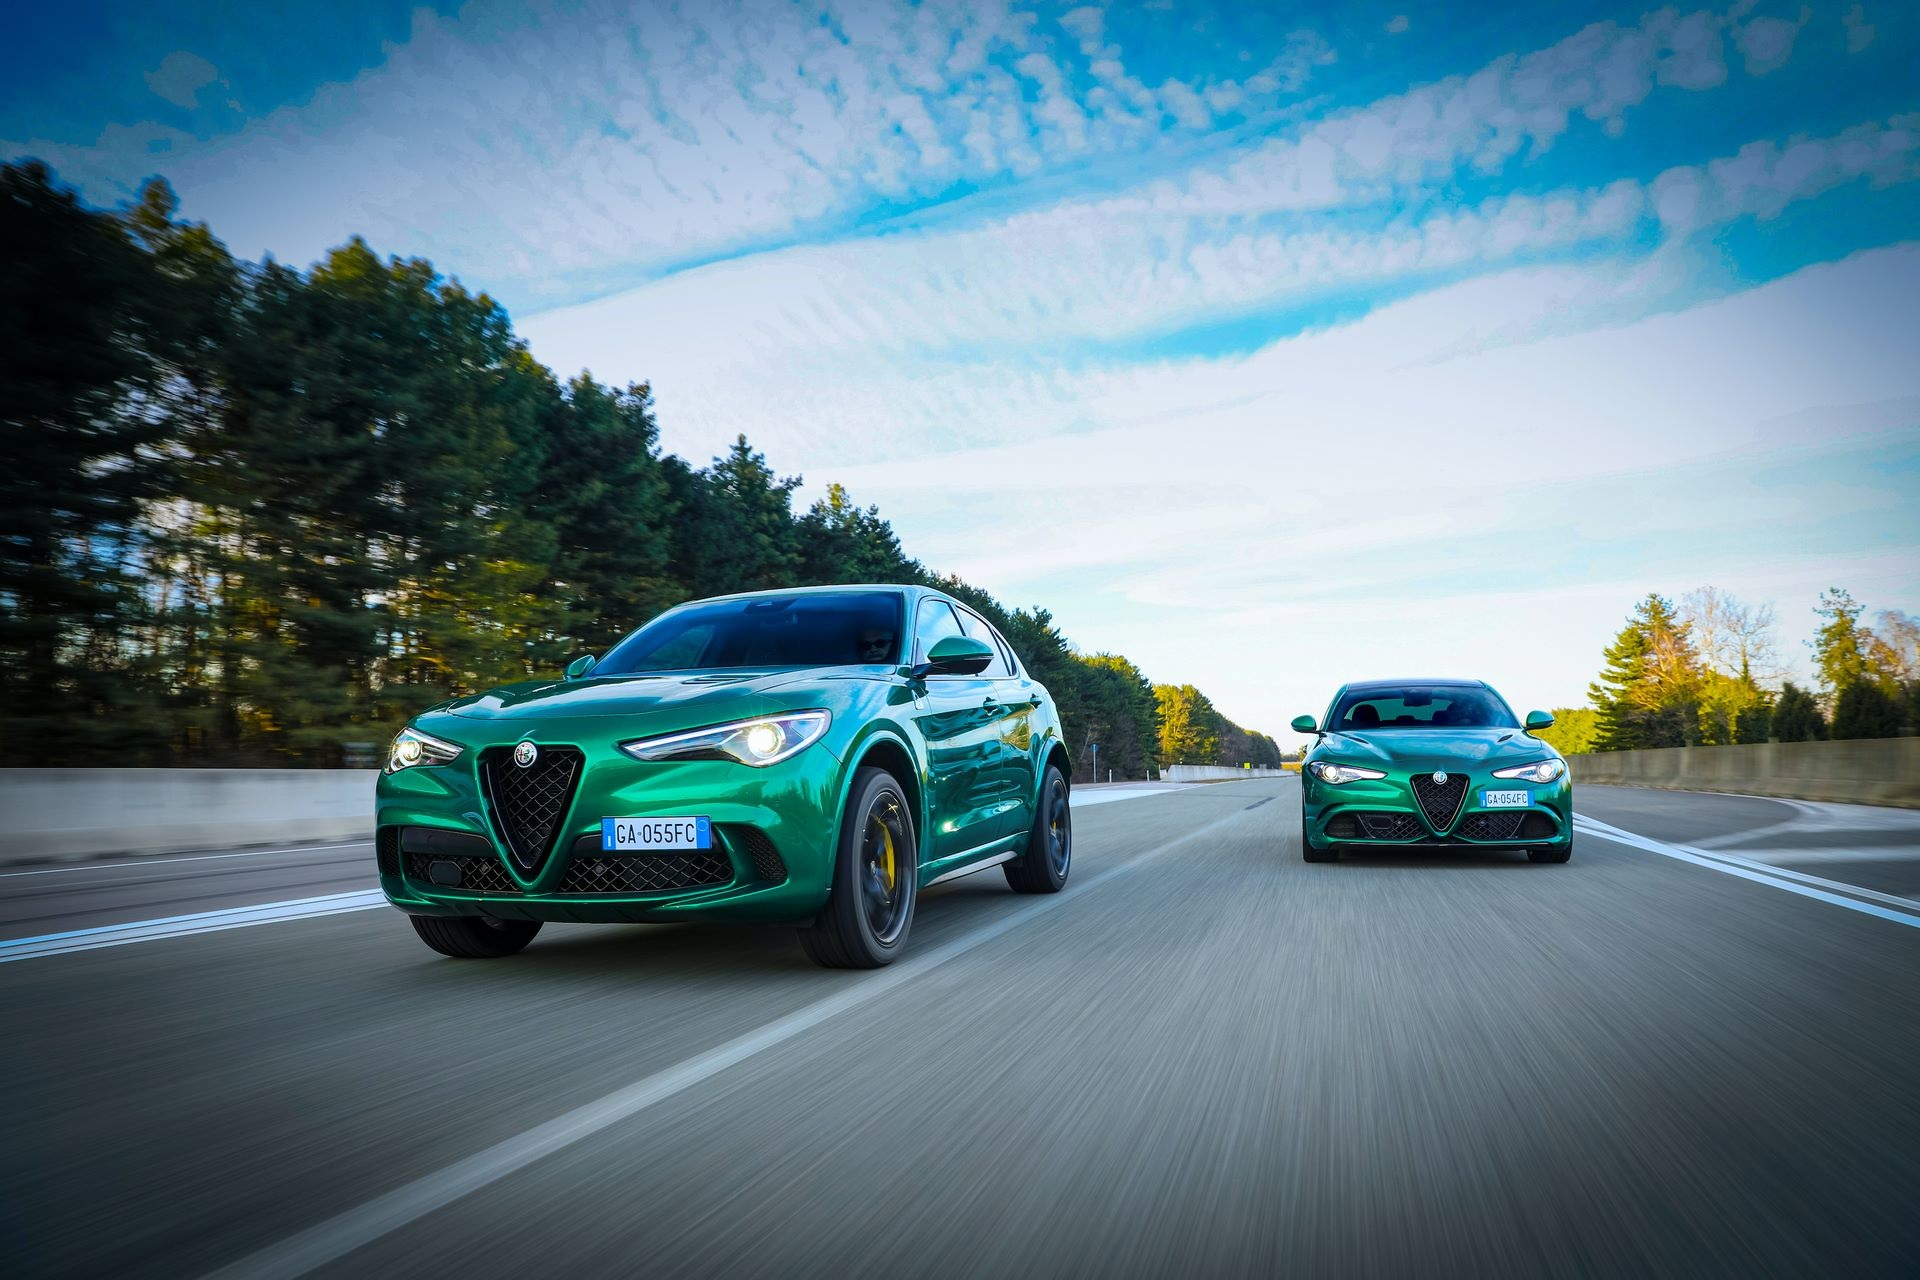 Alfa-Romeo-Giulia-Quadrifoglio-Stelvio-Quadrifoglio-facelift-2020-4